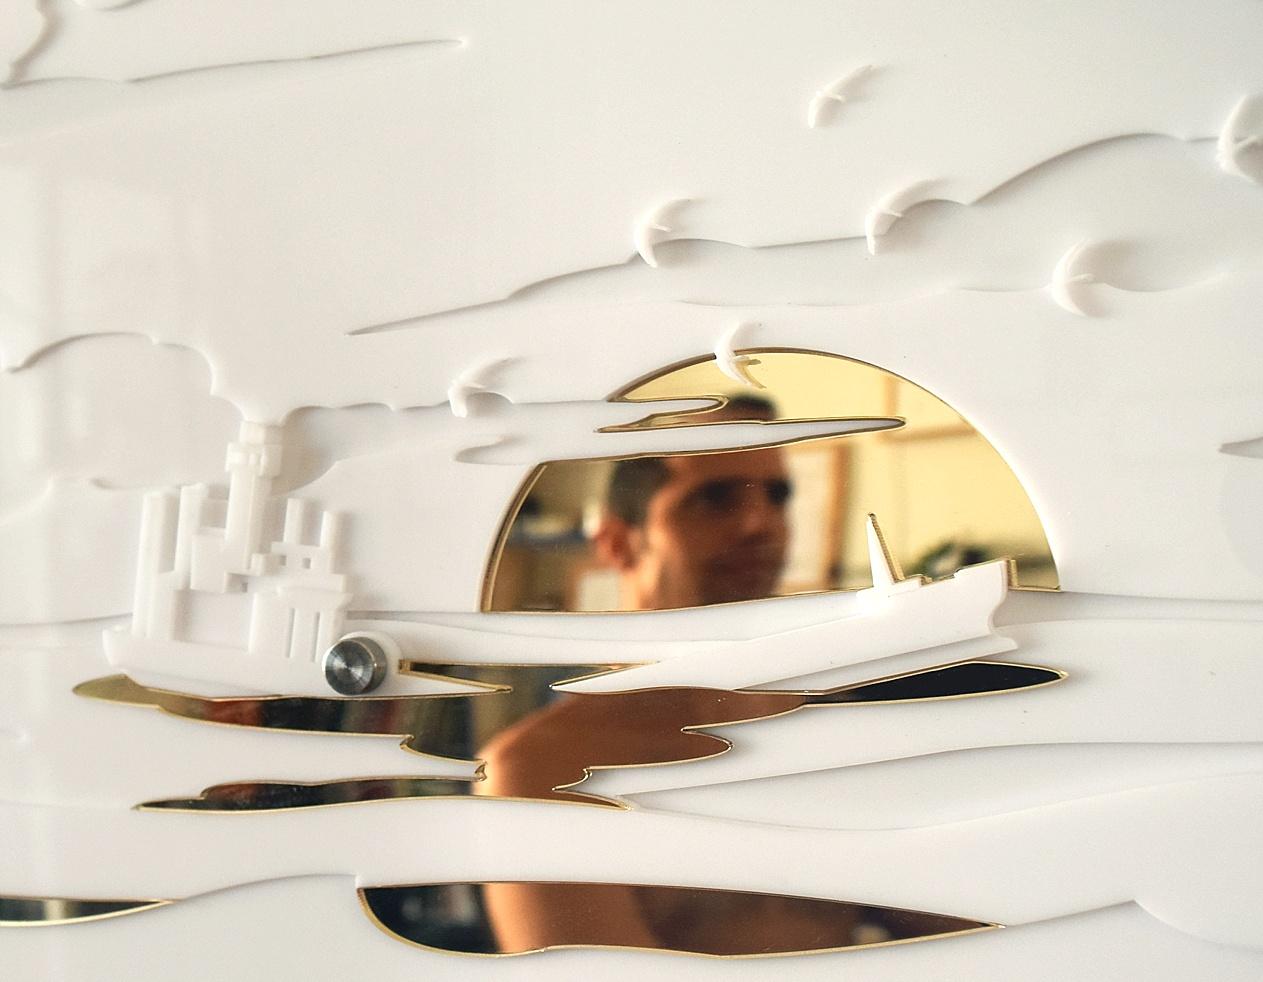 Design by StudioKnob : Storytelling lighting and home decor